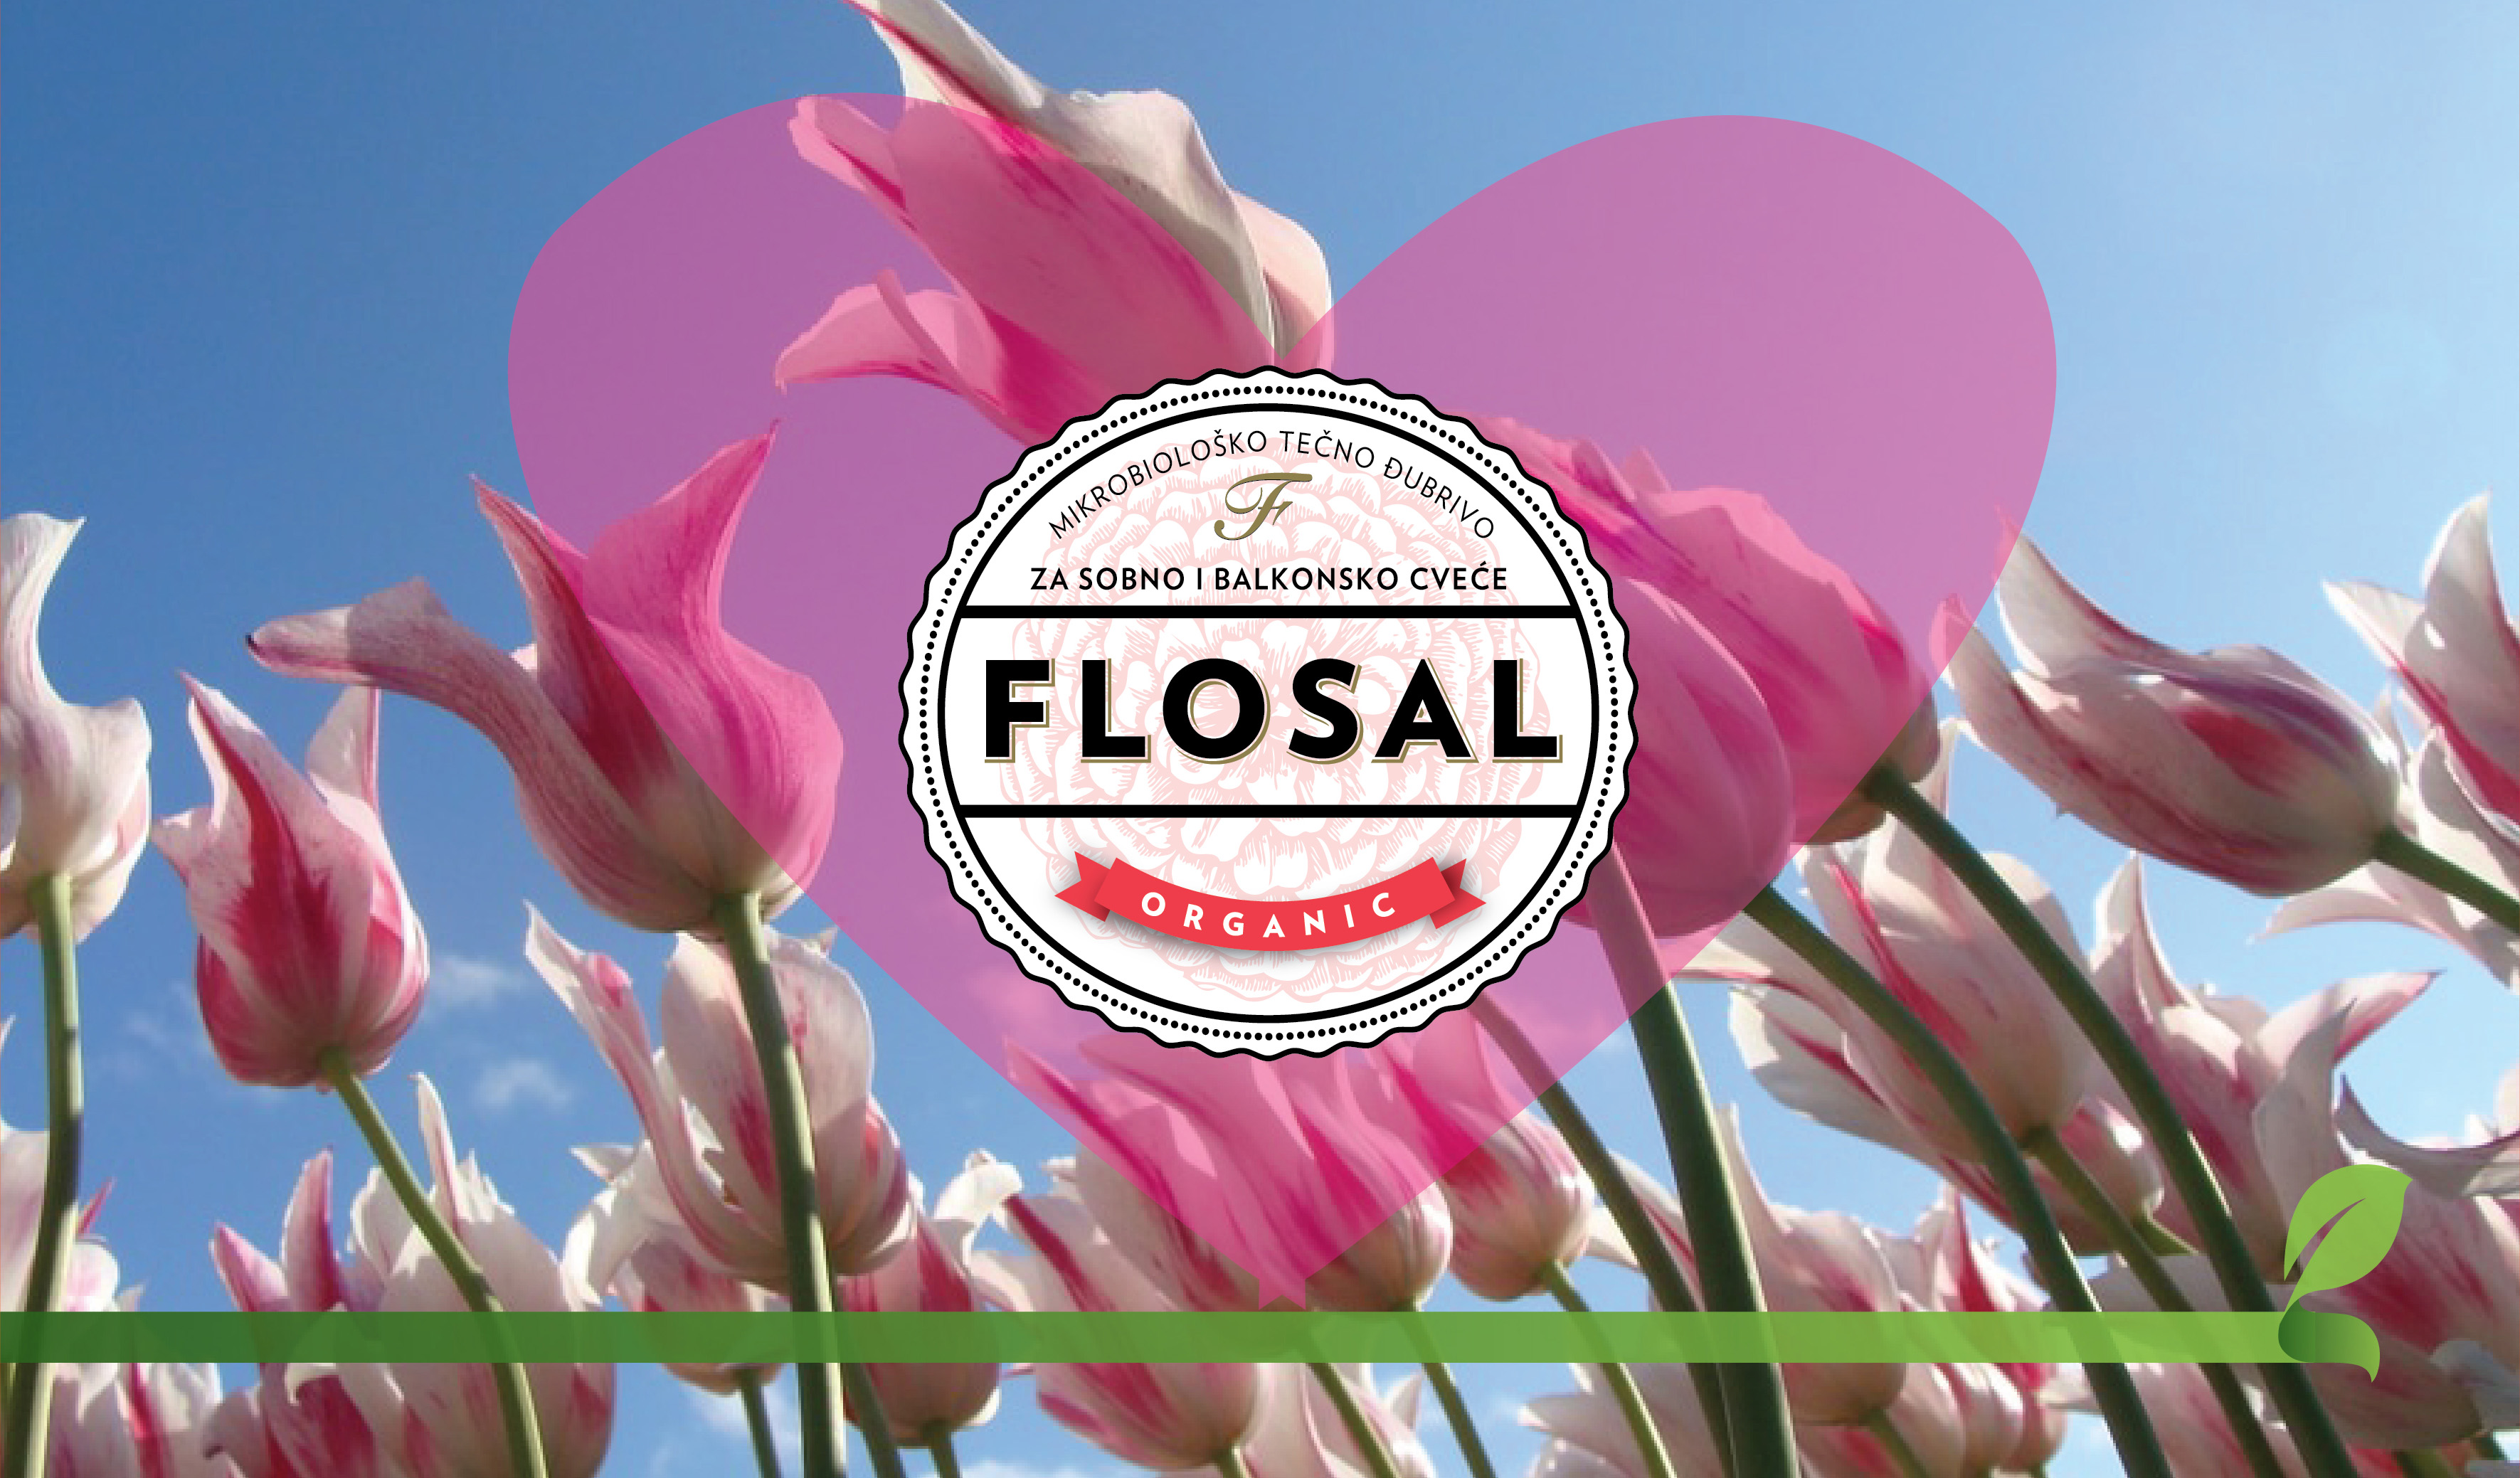 Dobrodošli u Flosalovu cvetnu porodicu